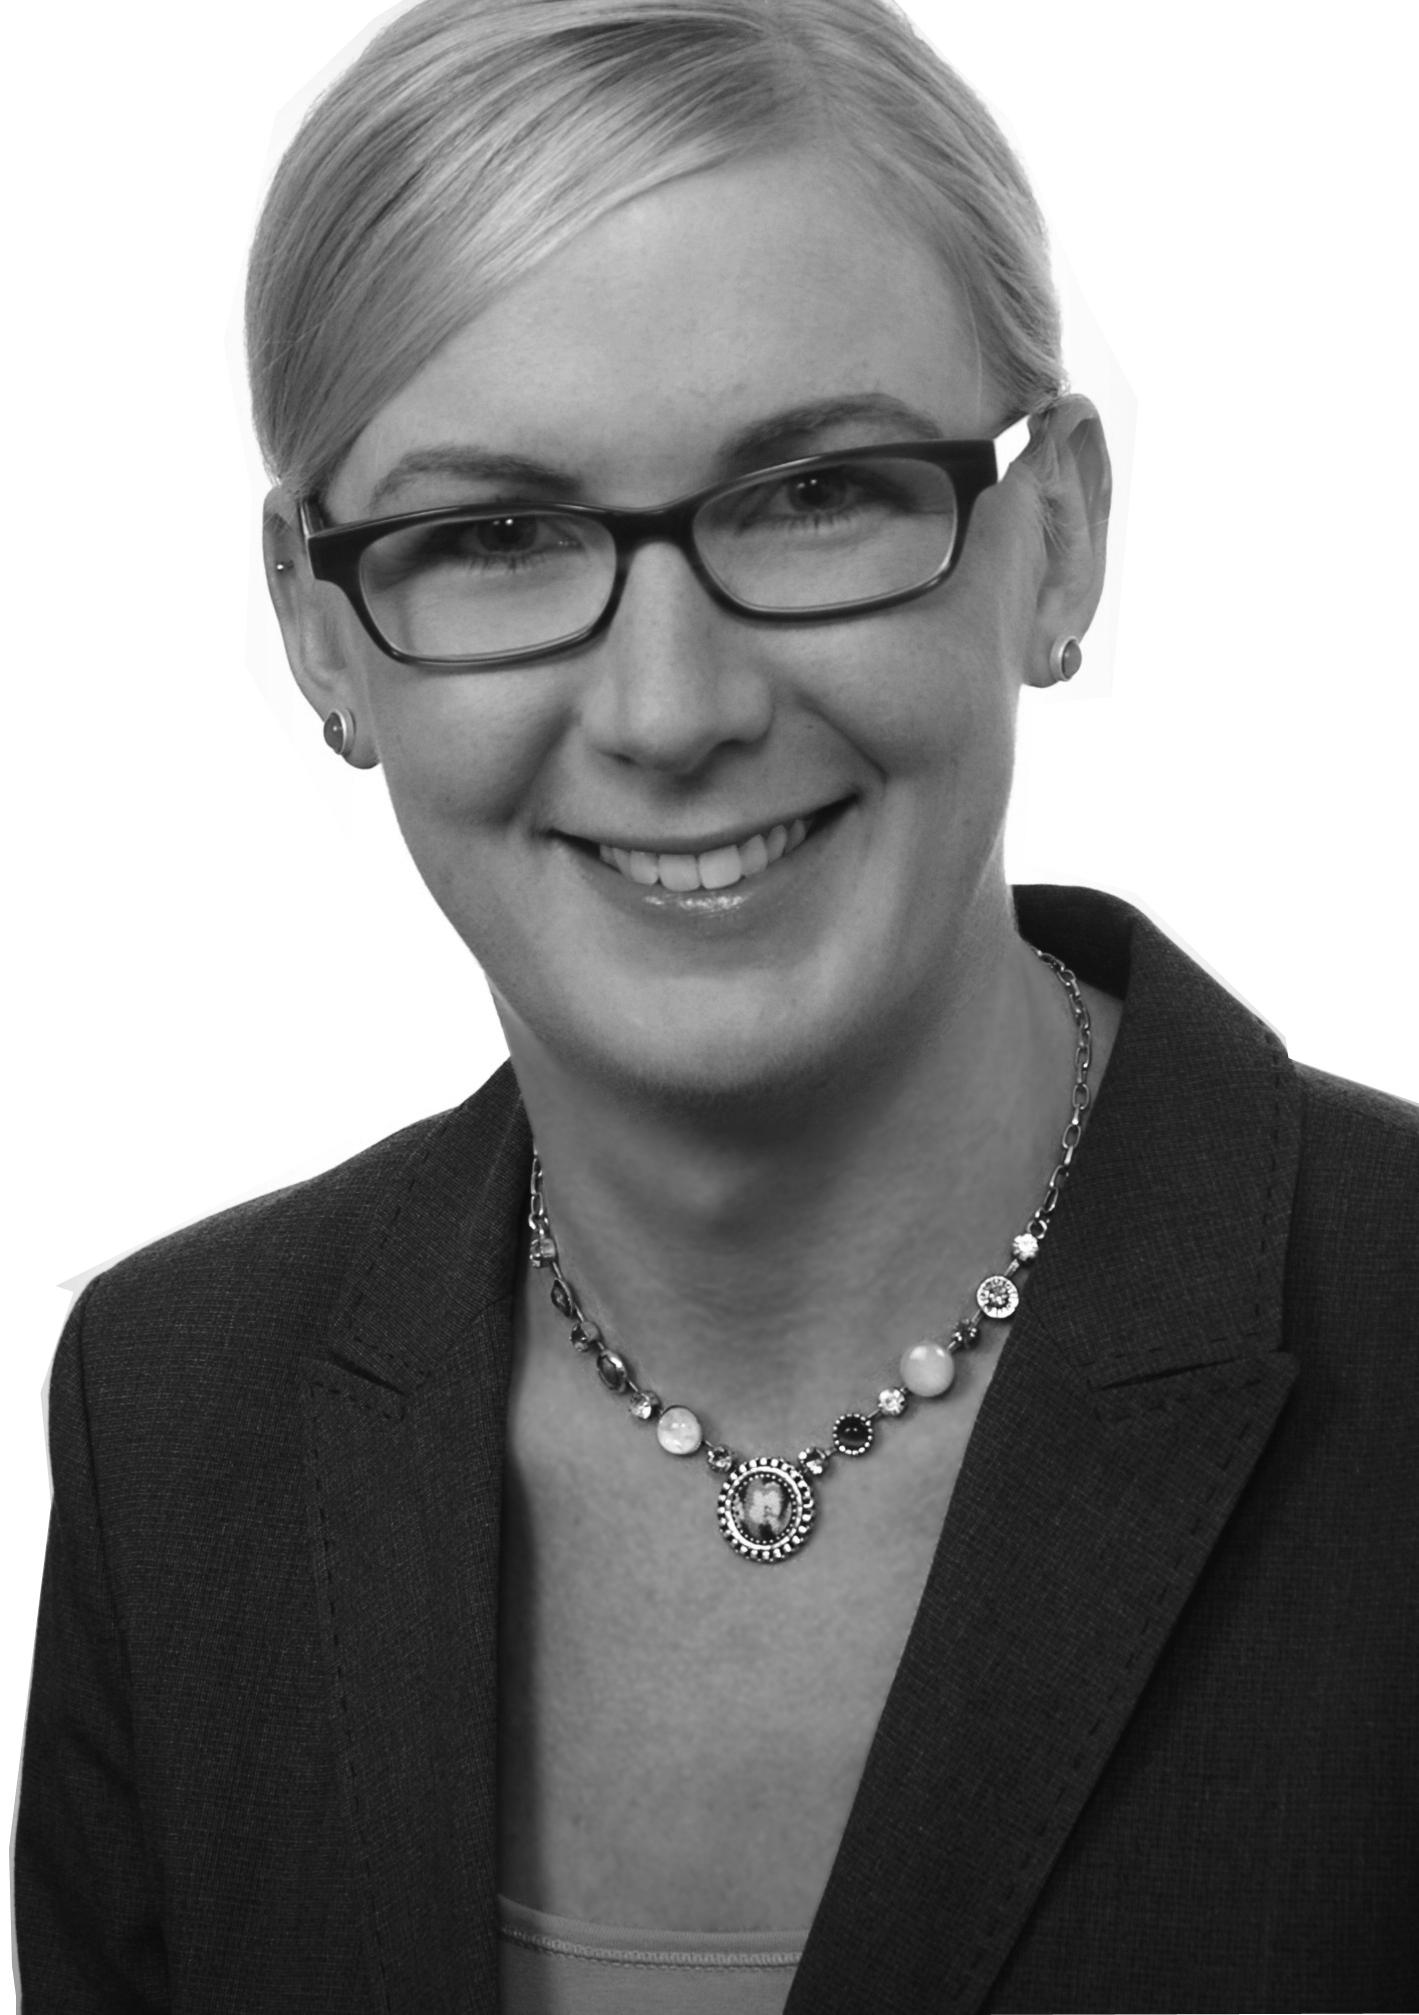 Portraitfoto: Eva-Maria Schön